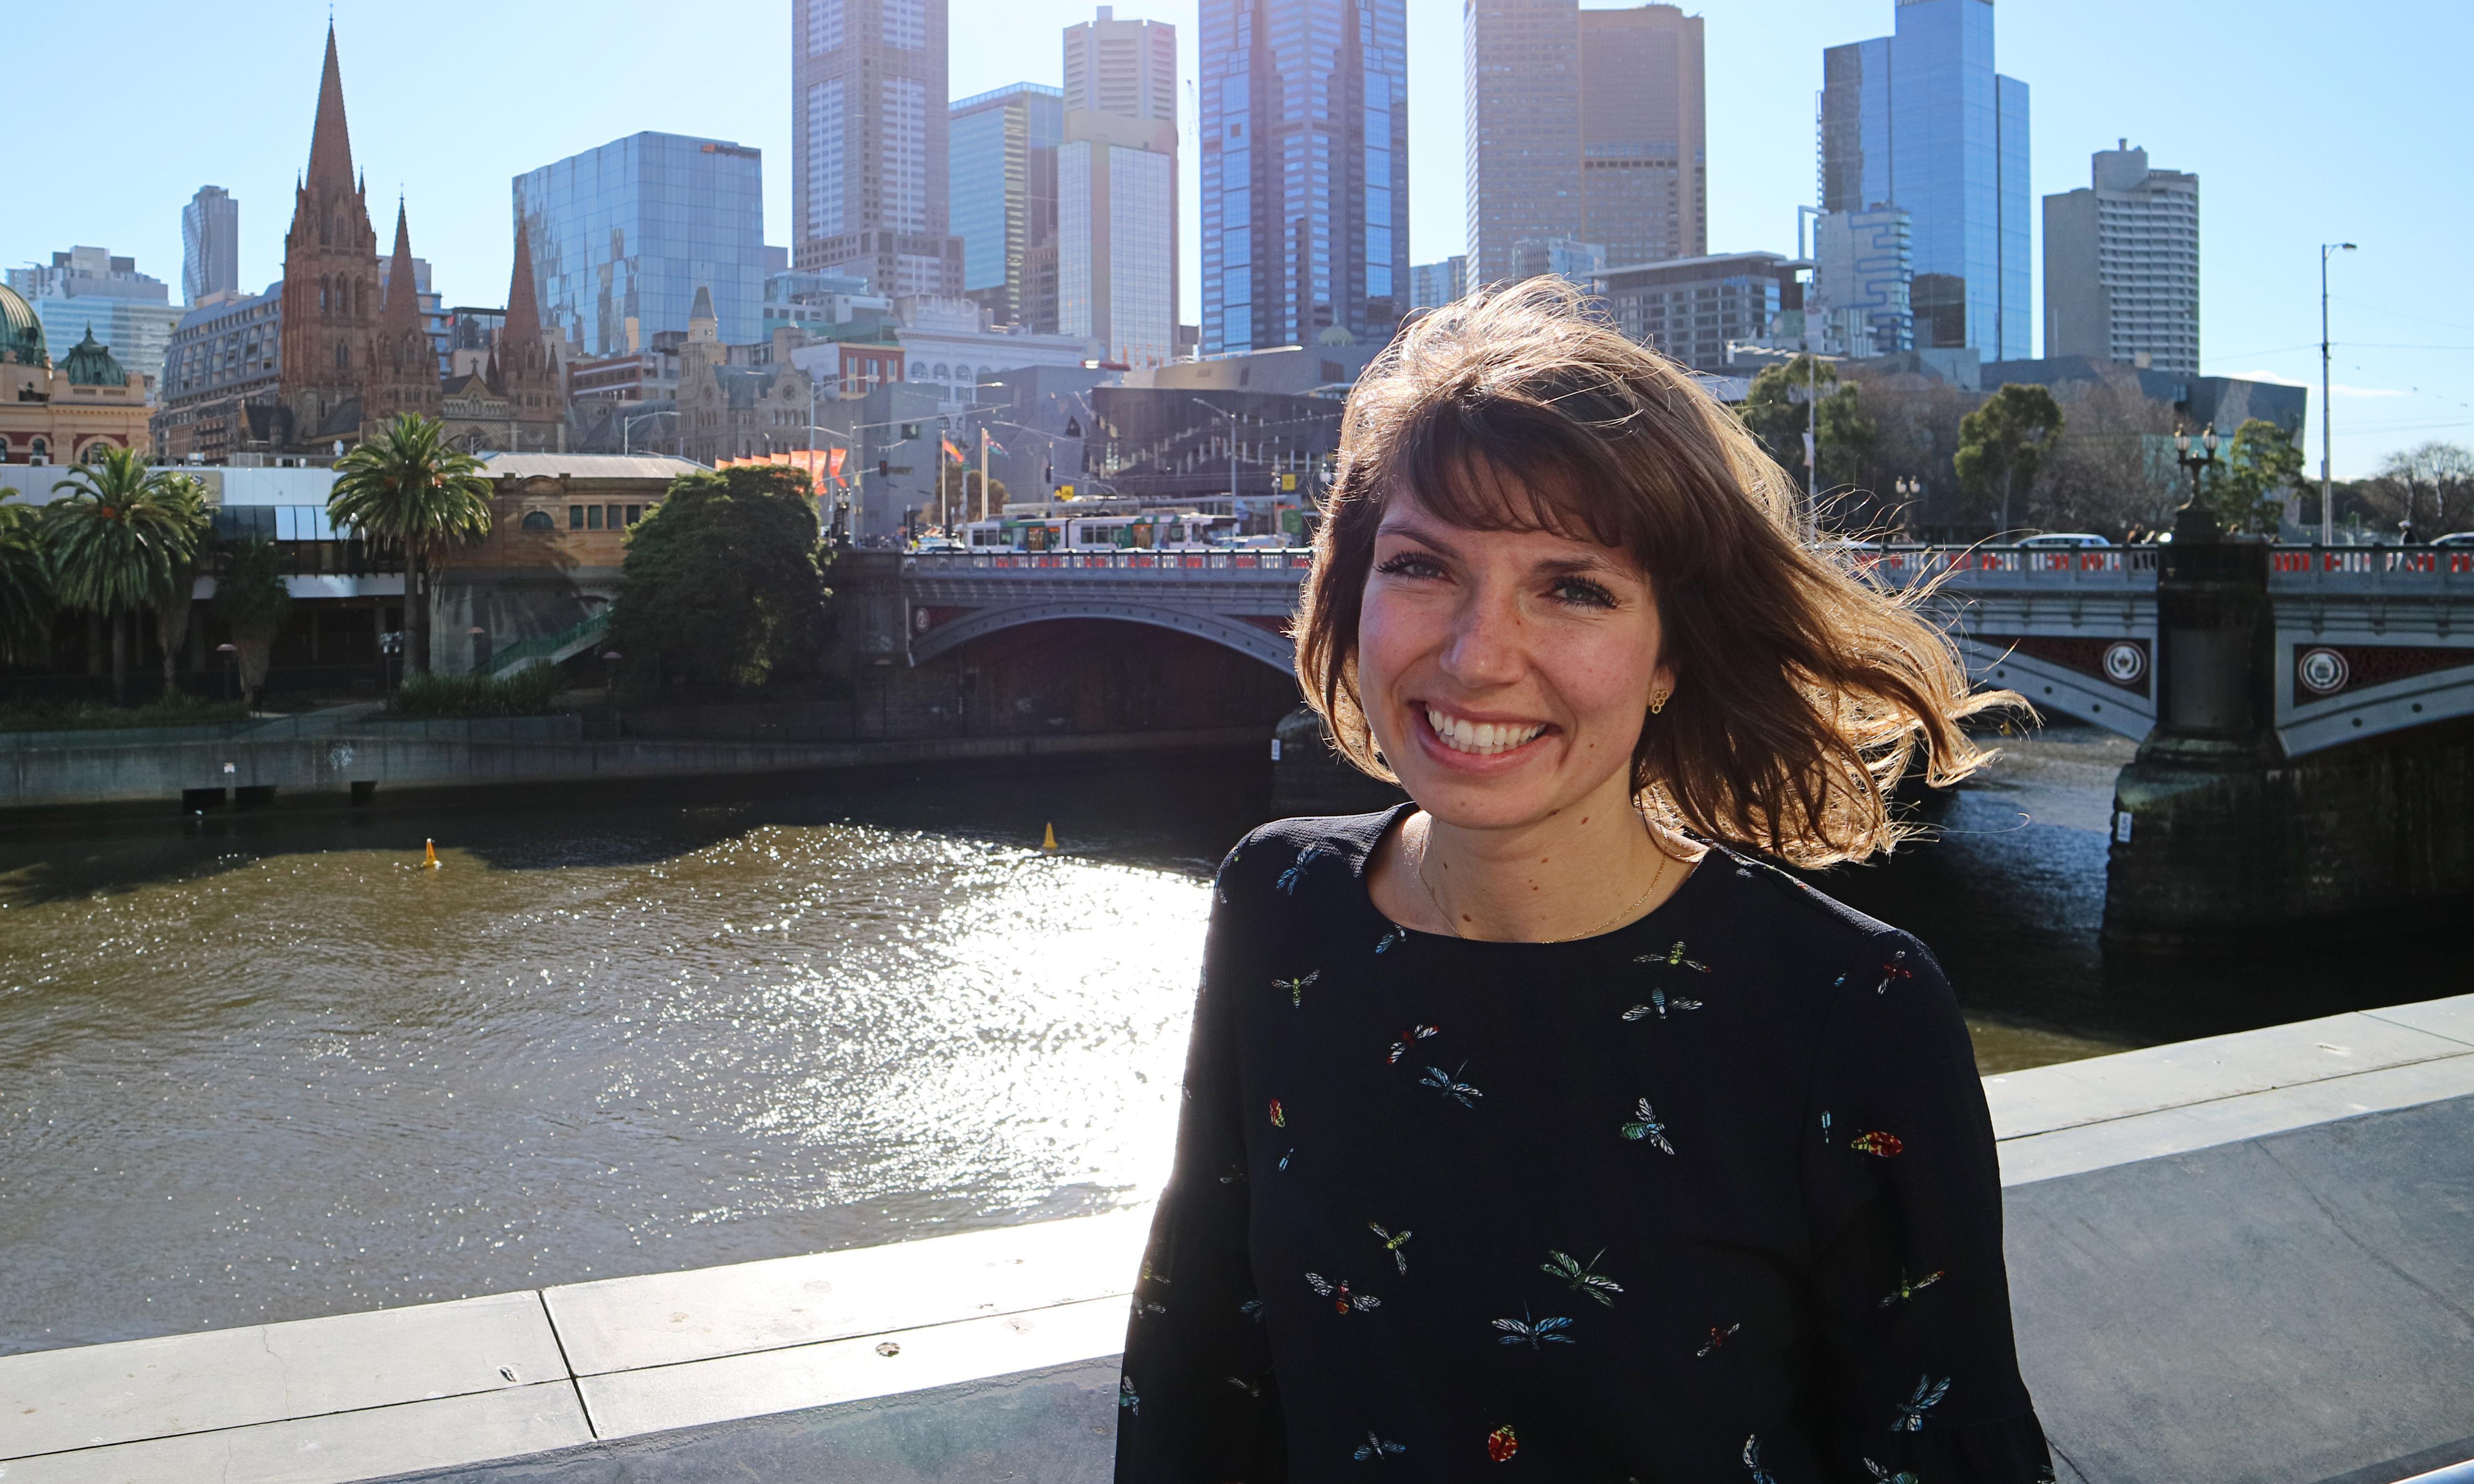 Man jailed for 11 years for killing Dutch cyclist Gitta Scheenhouwer in Melbourne